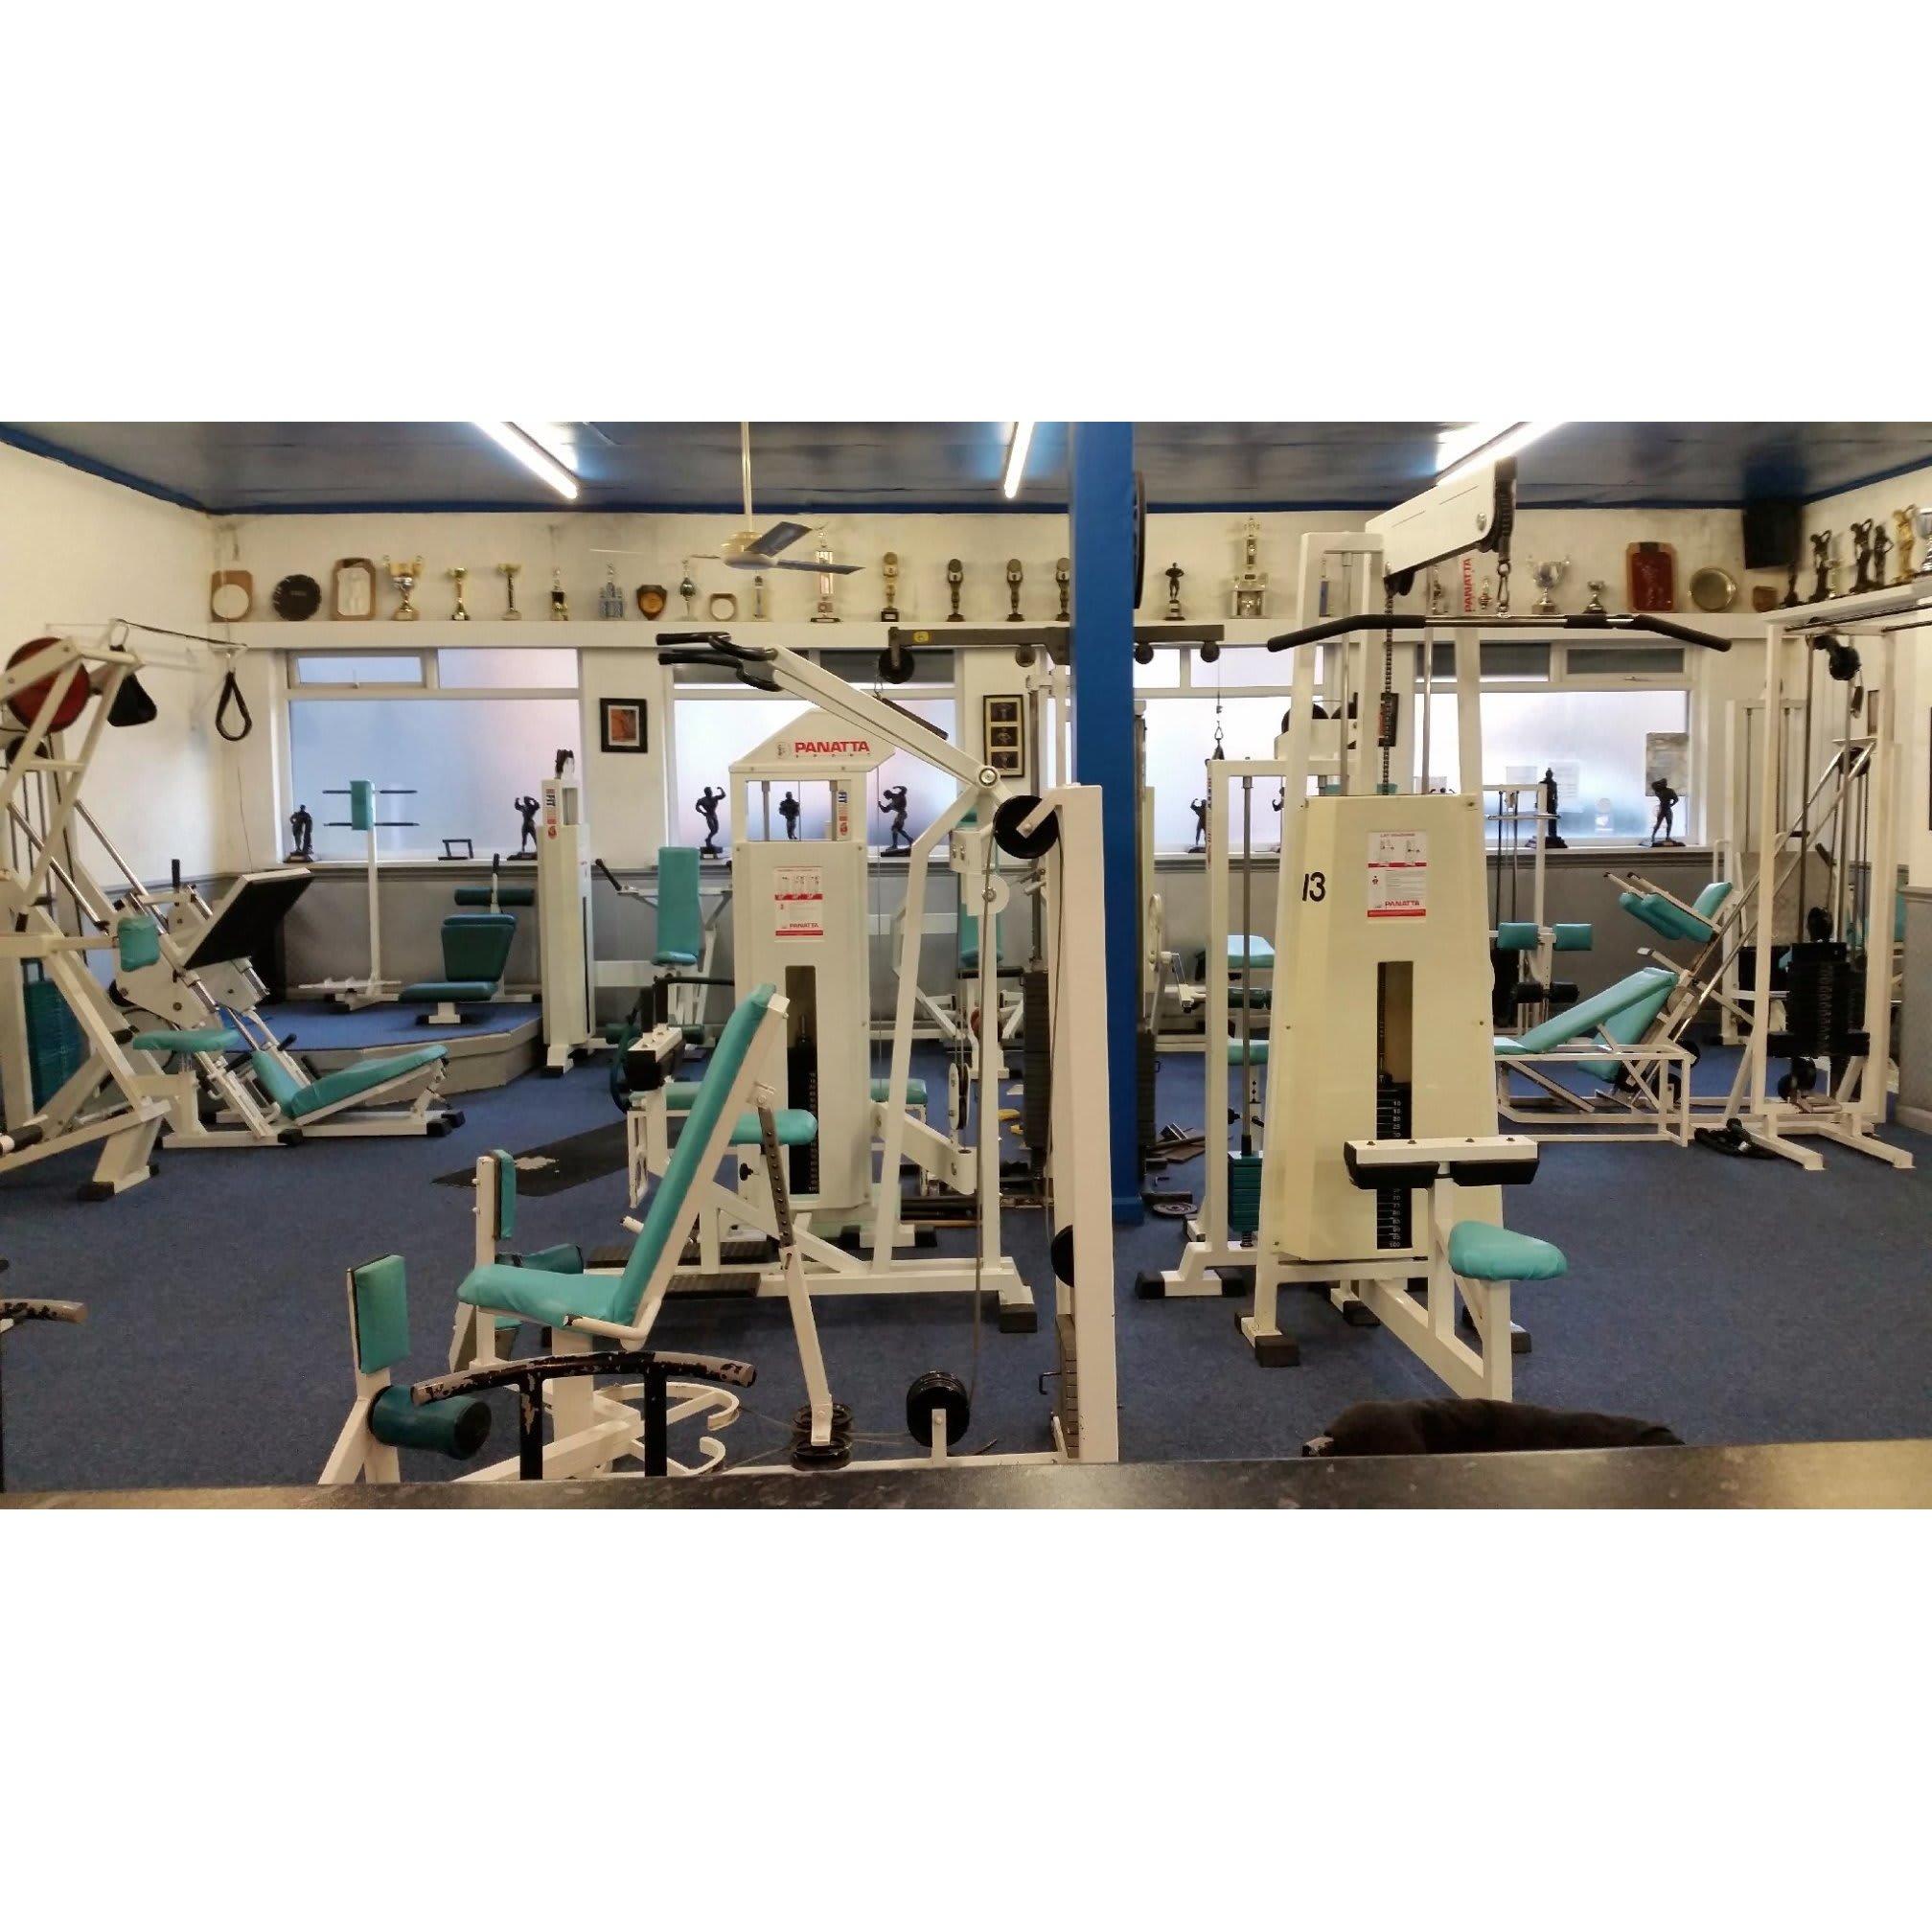 Bruce's Gym